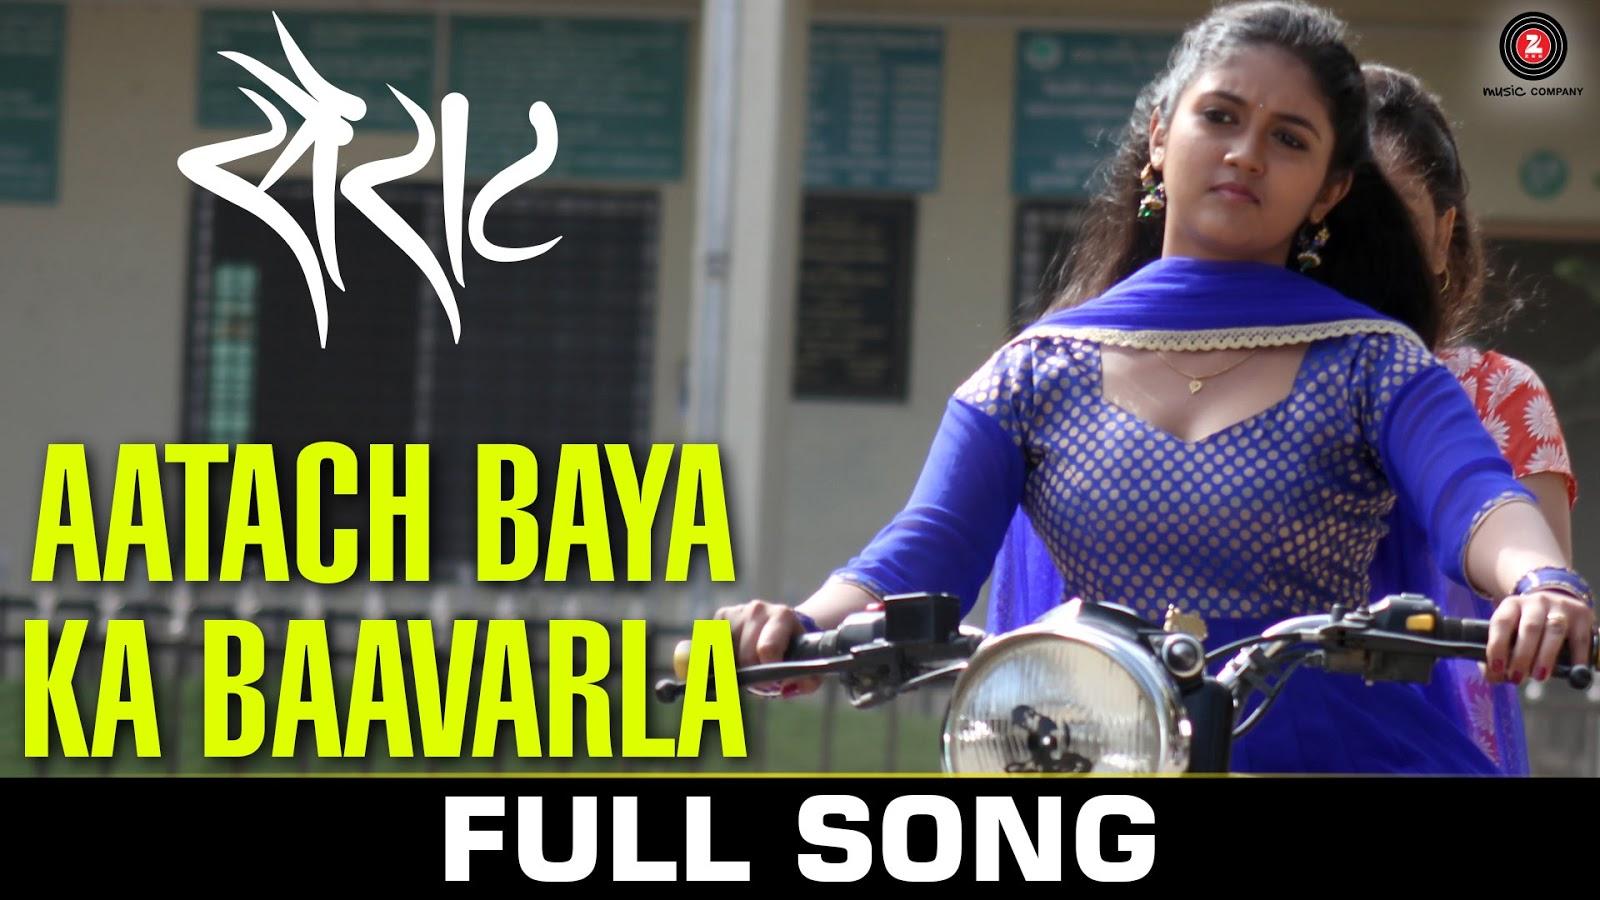 Aatach Baya Ka Baavarla Lyrics - Sairat | Popsongs.club